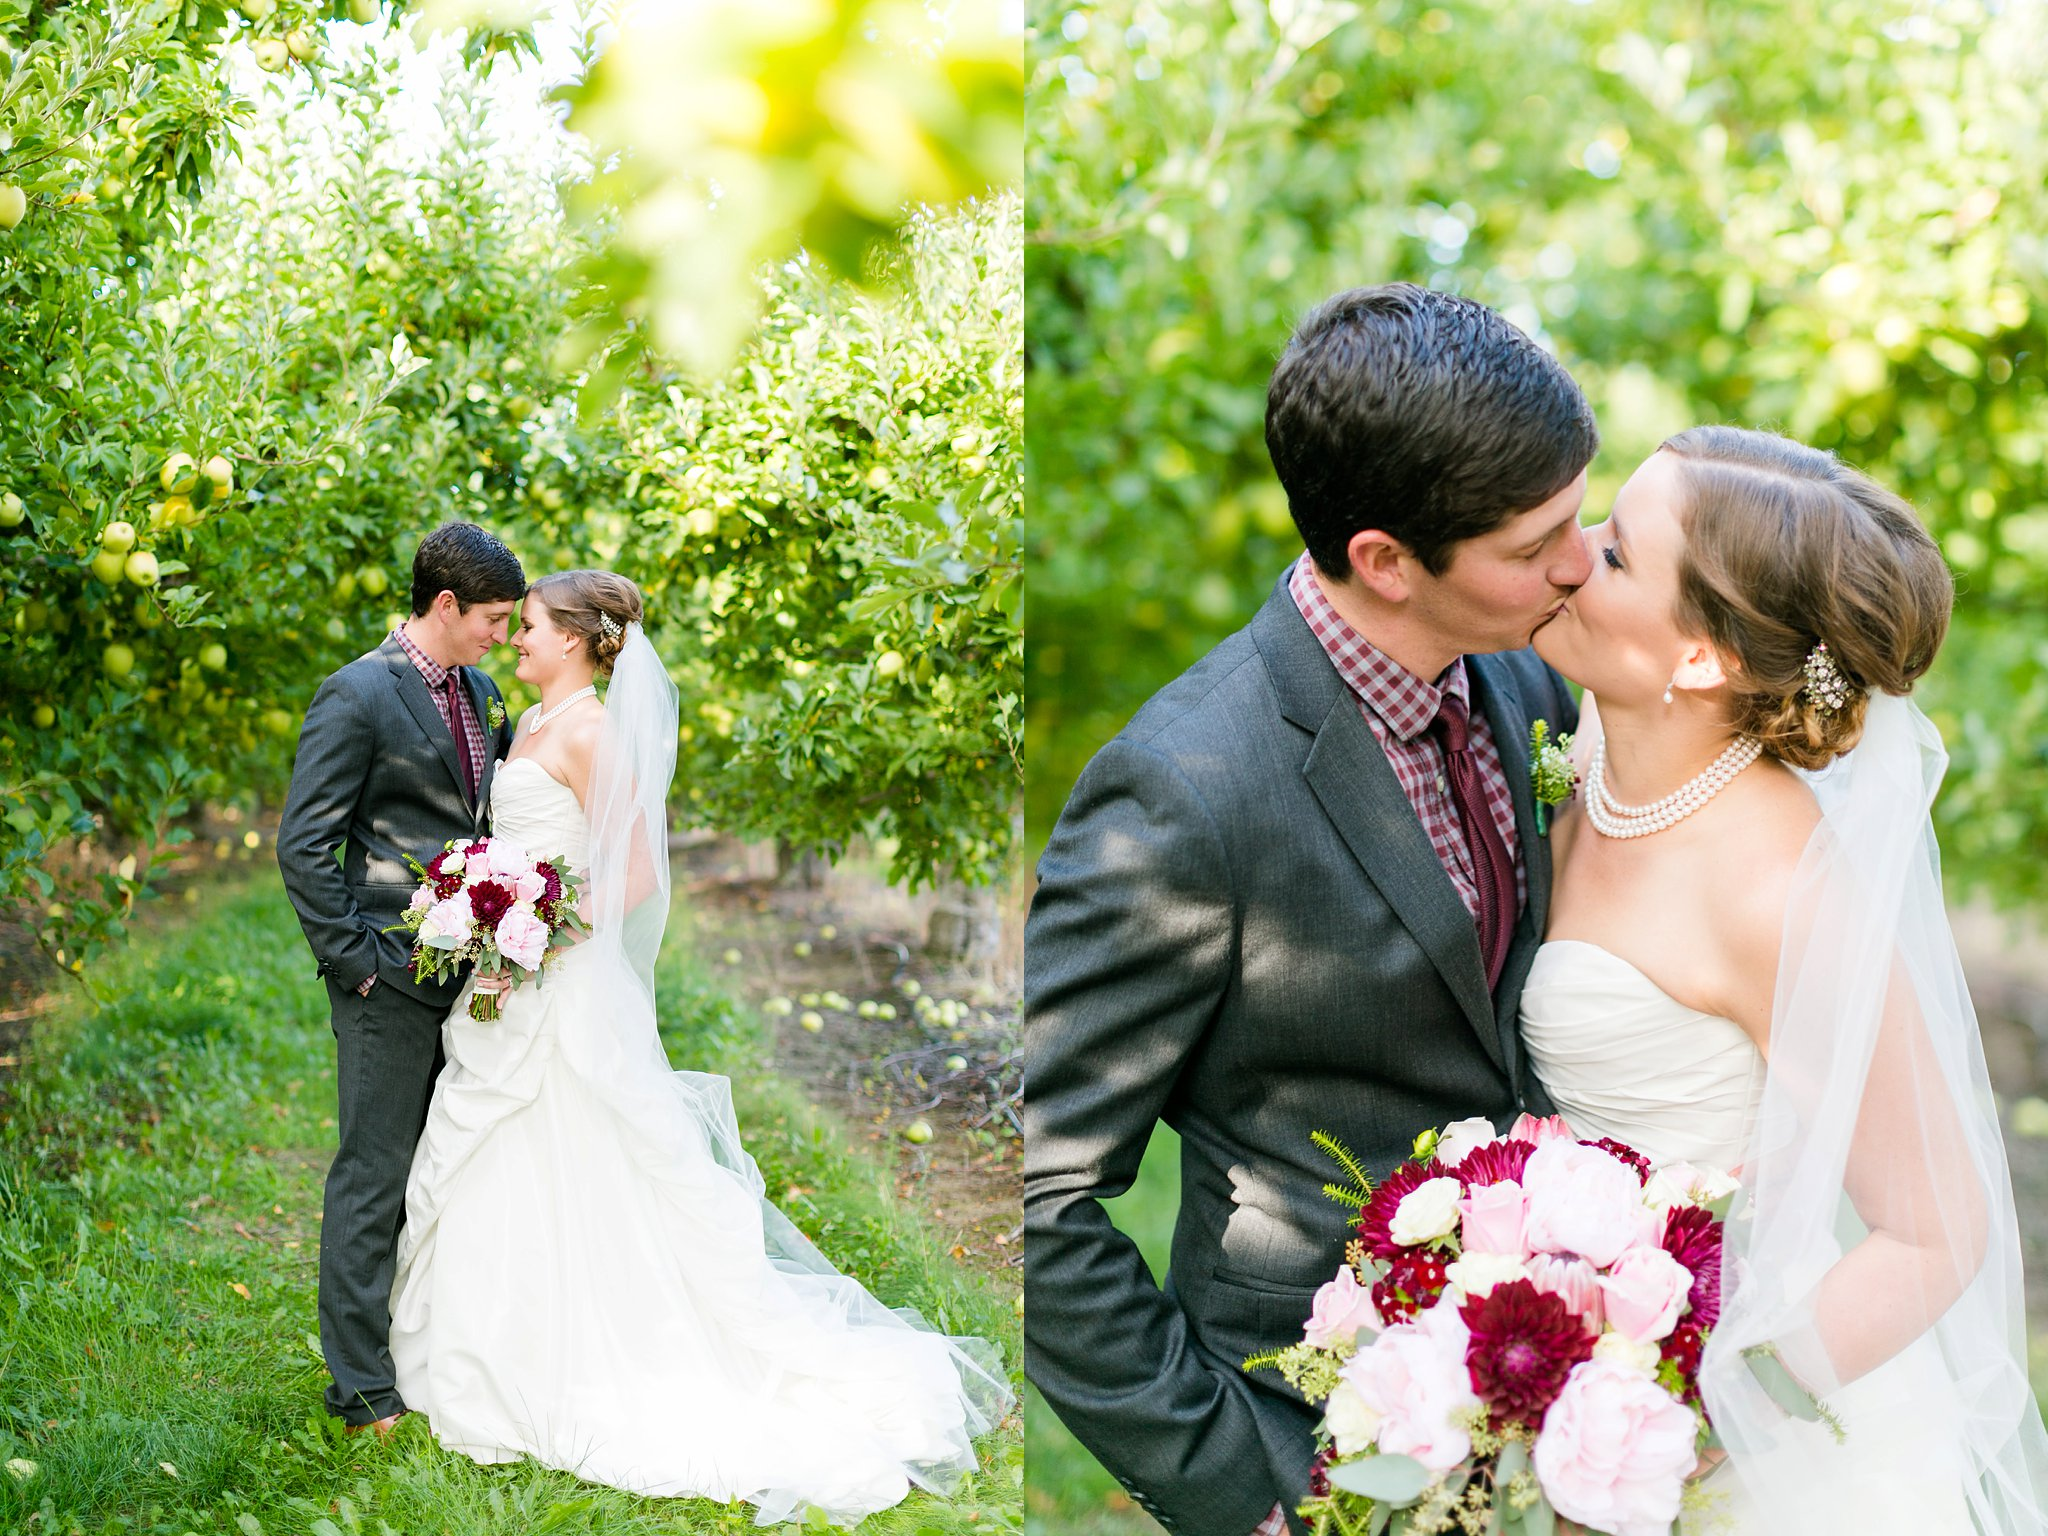 Chelan Washington Wedding Photos Megan Kelsey Photography Delight Wedding Workshop Styled Shoot Annalee & Scot-99.jpg